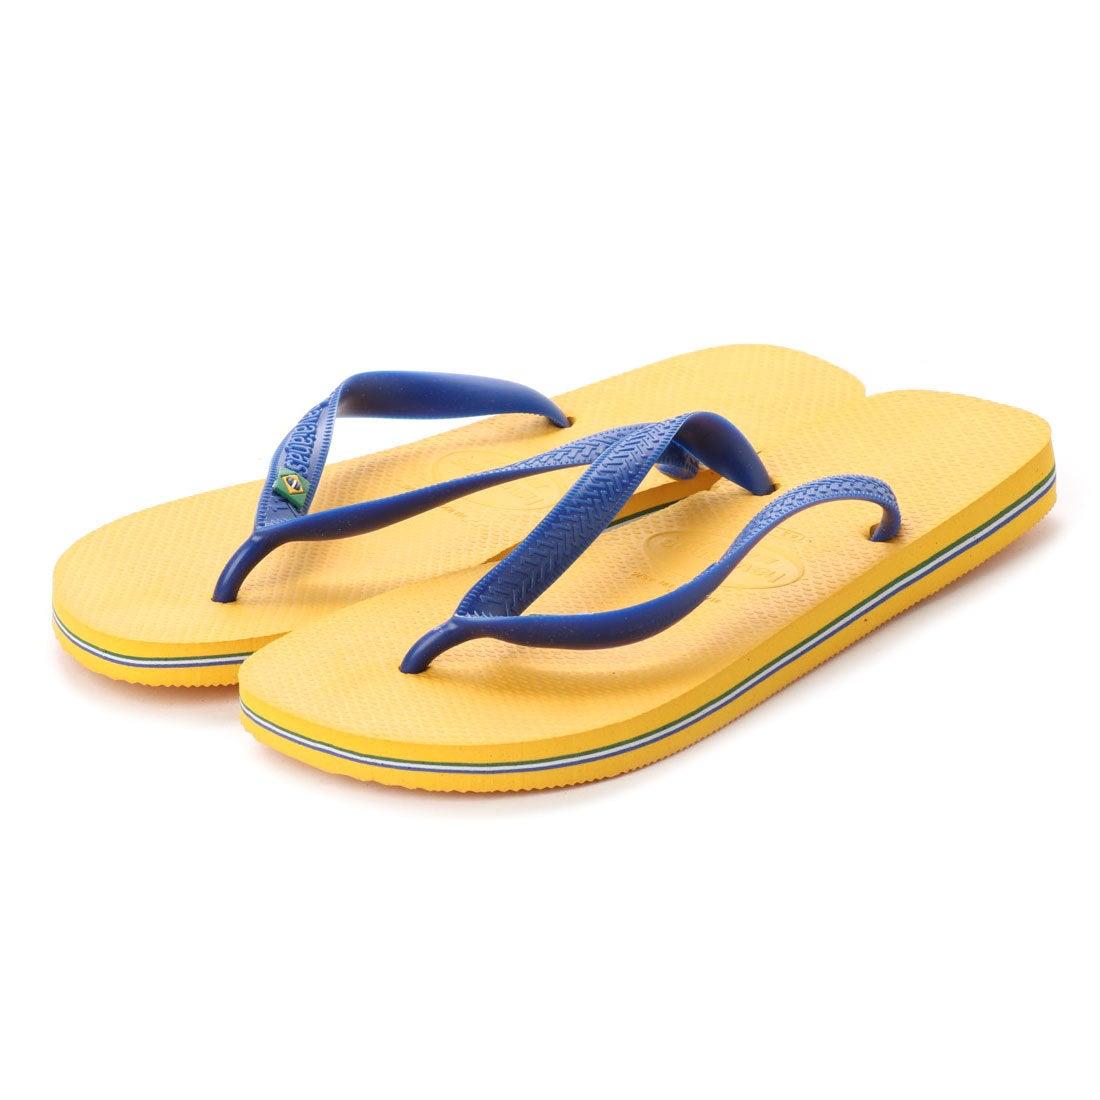 【SALE 20%OFF】ハワイアナス havaianas BRASIL (banana yellow) レディース メンズ